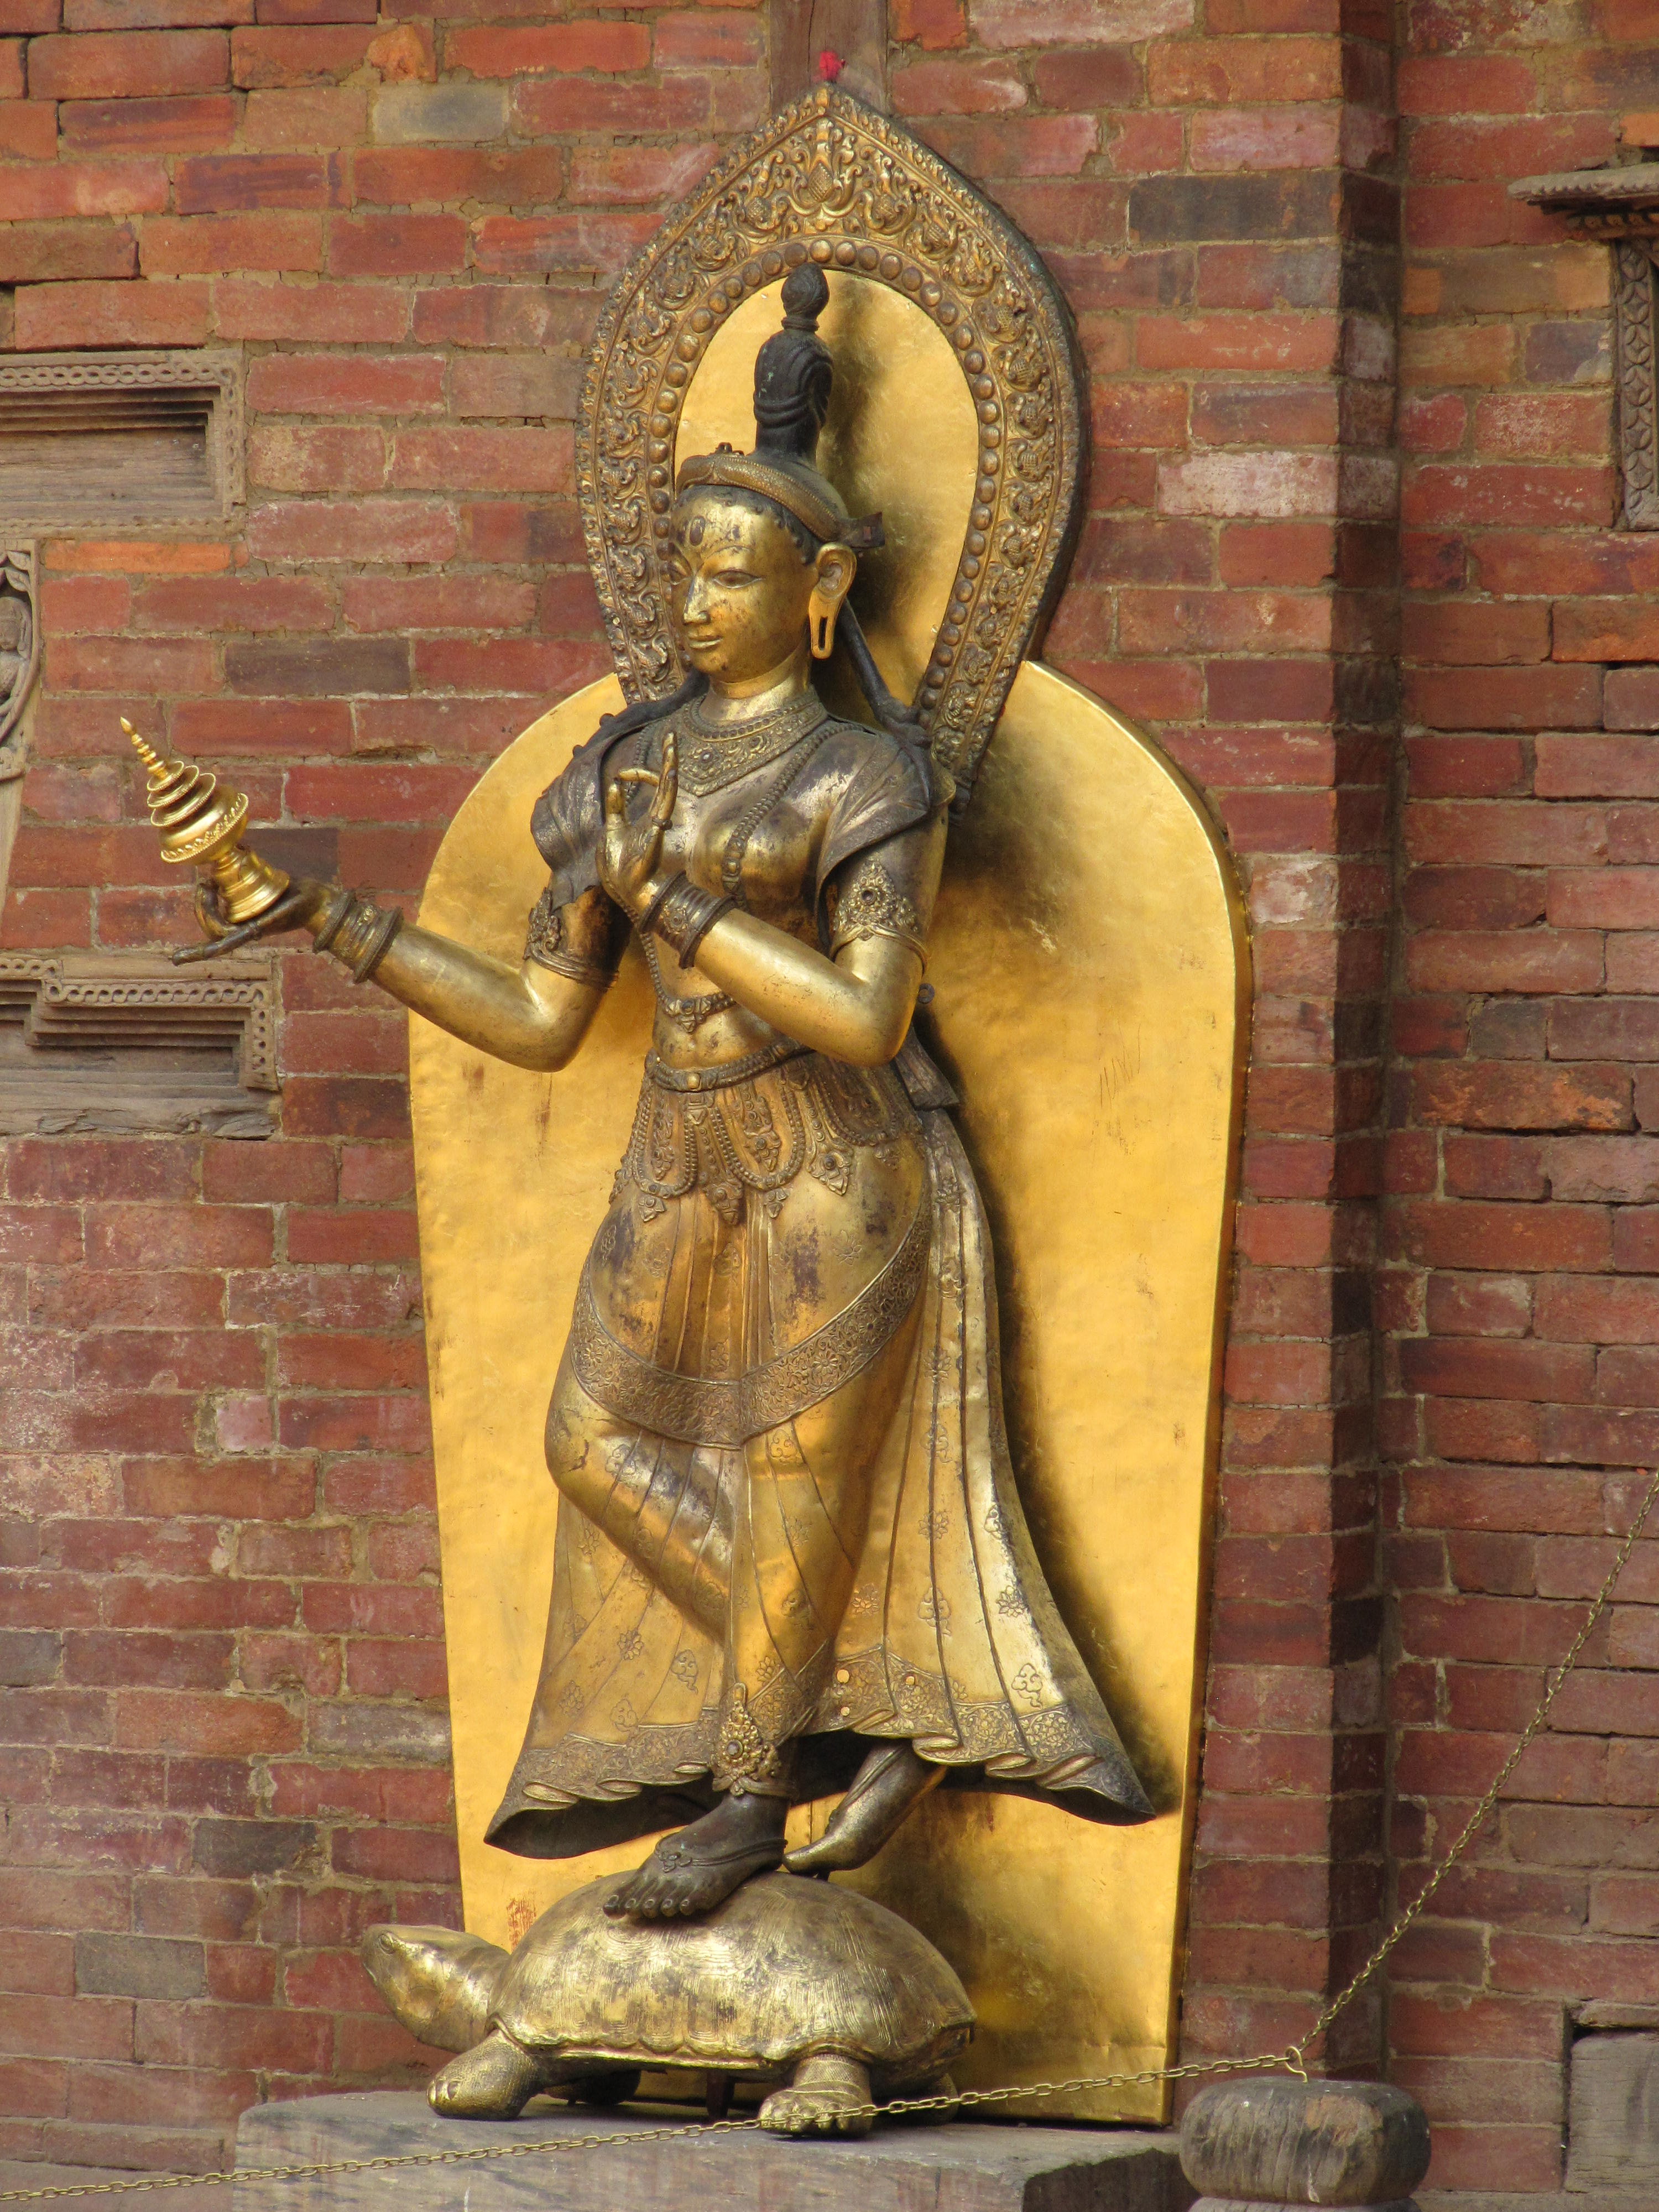 Golden statue in Patan